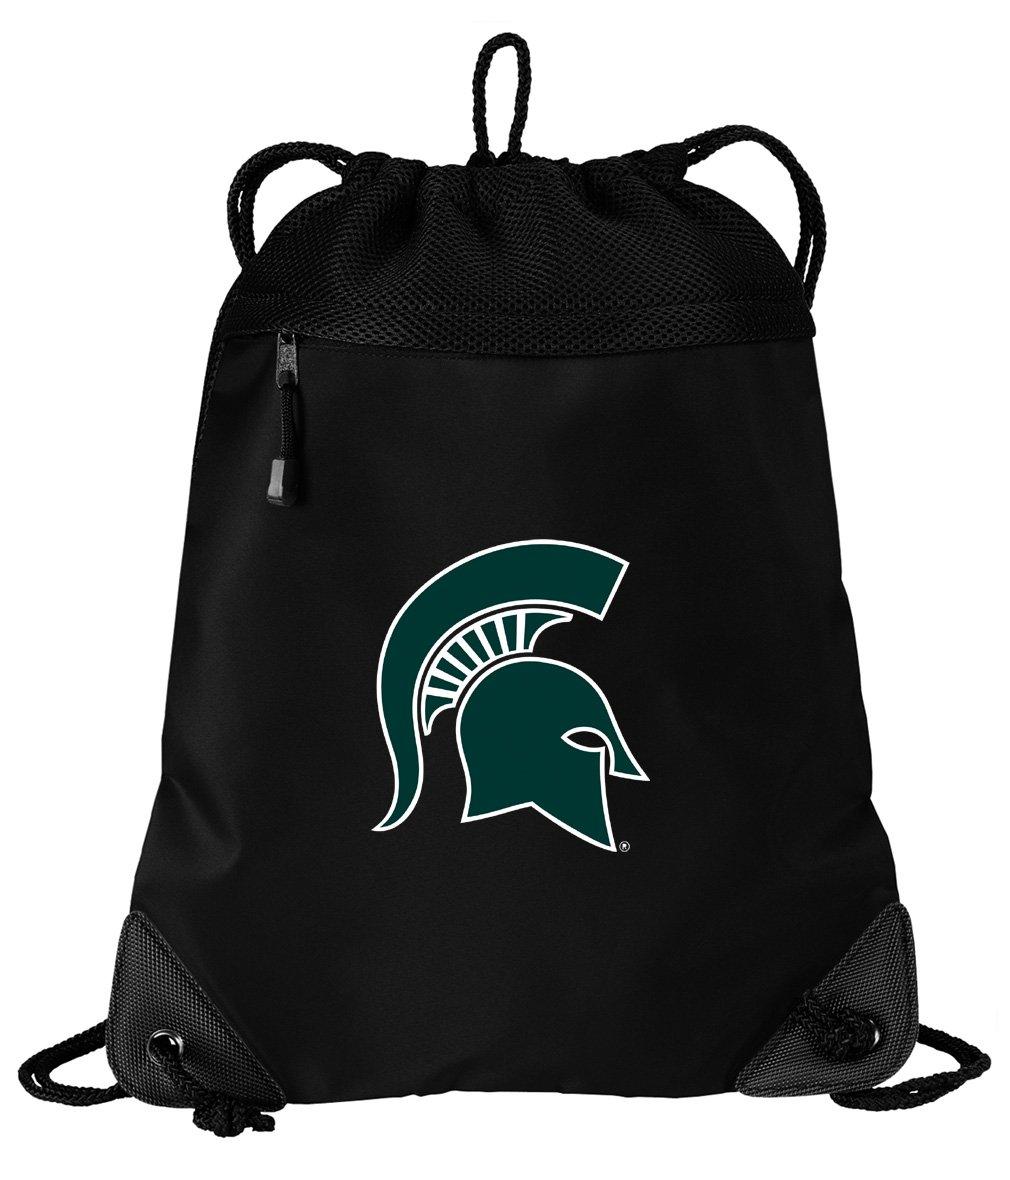 Broad Bay Michigan State Drawstring Bag Michigan State University Cinch Pack Backpack UNIQUE MESH & MICROFIBER